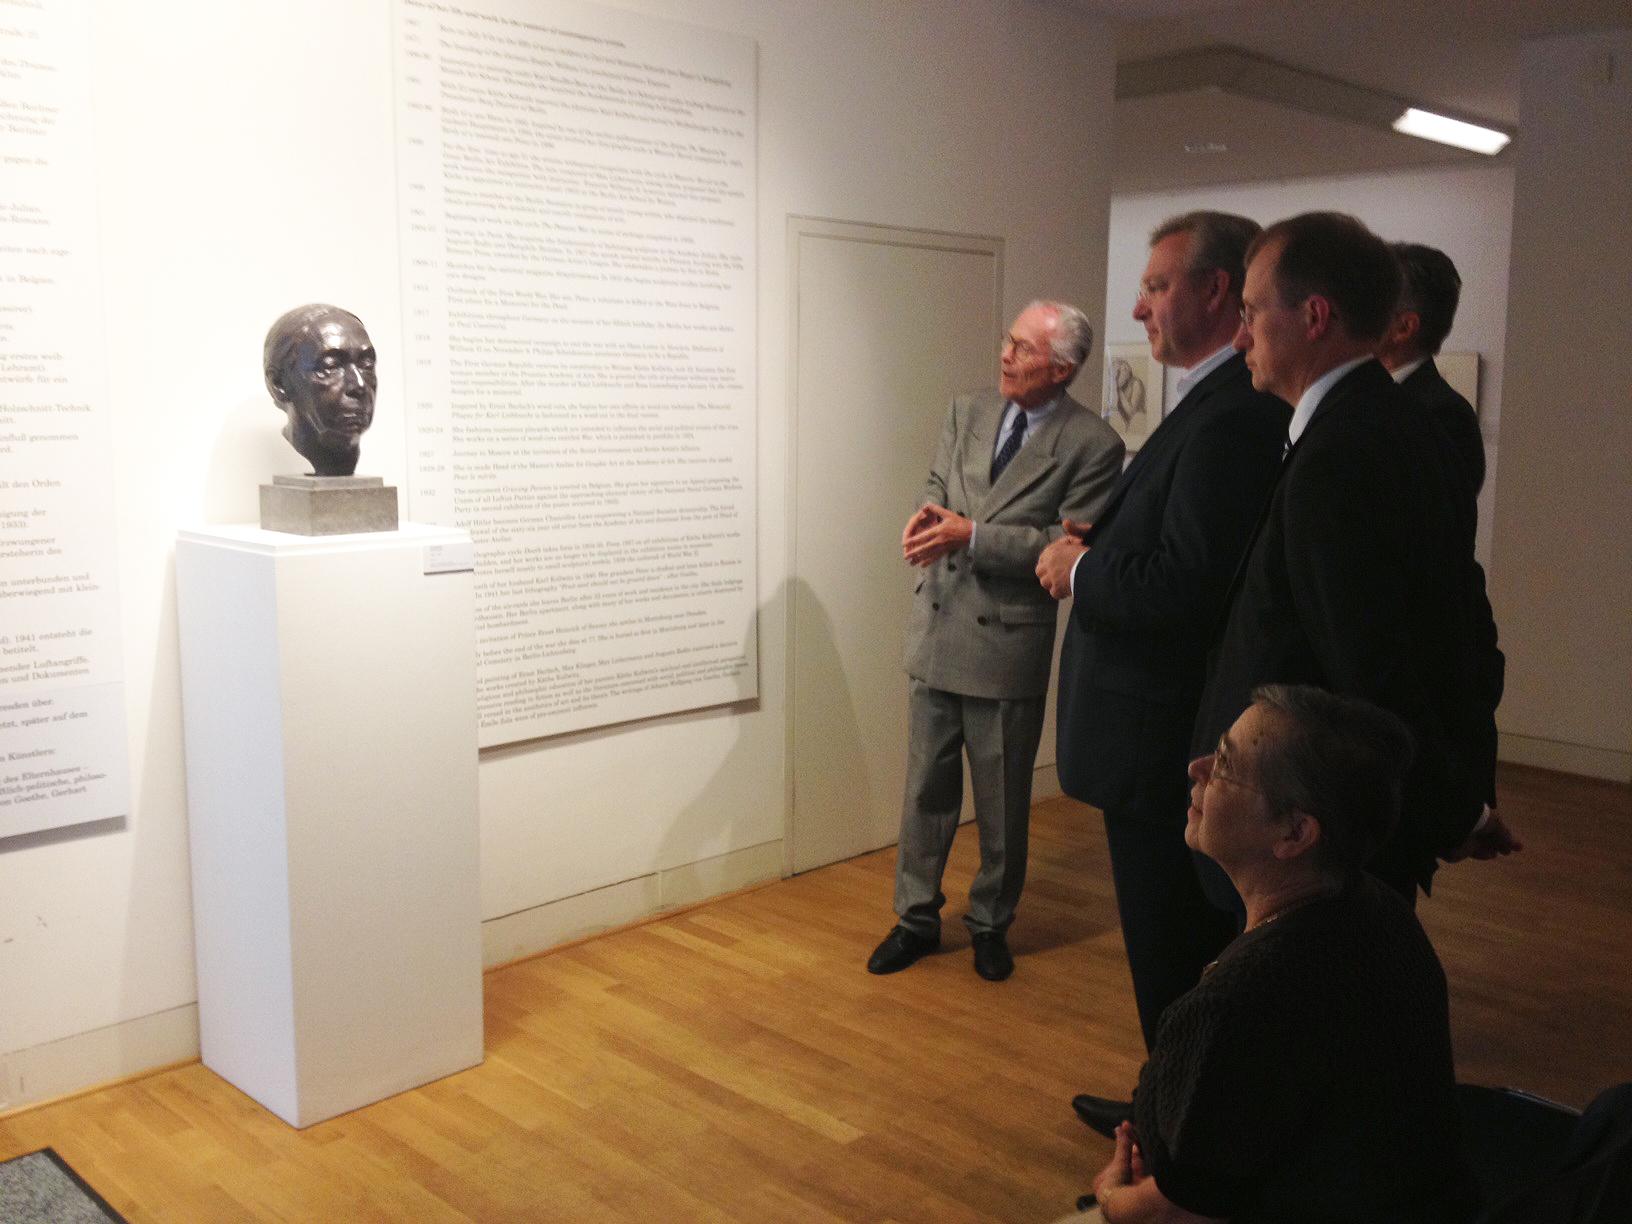 Frank Henkel besucht das Käthe-Kollwitz-Museum